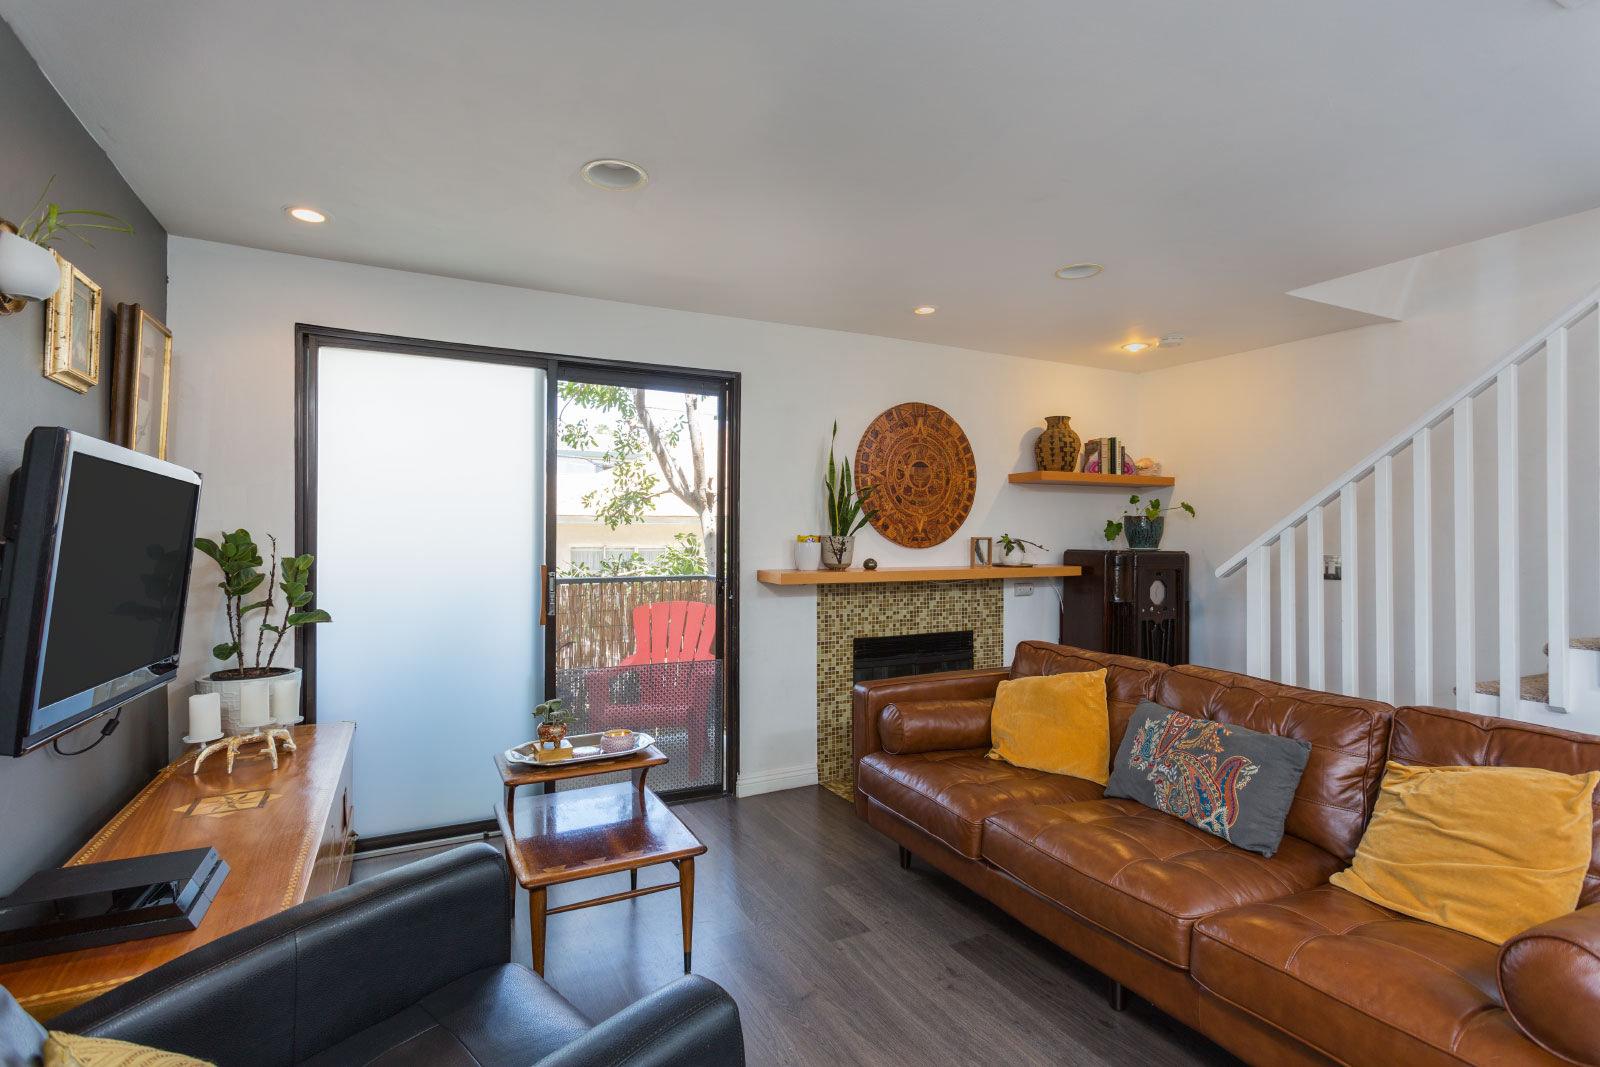 1600 REDONDO AVE. #10 LONG BEACH, CA 90806   2 Bed/1.5 Bath/ 815 sq ft